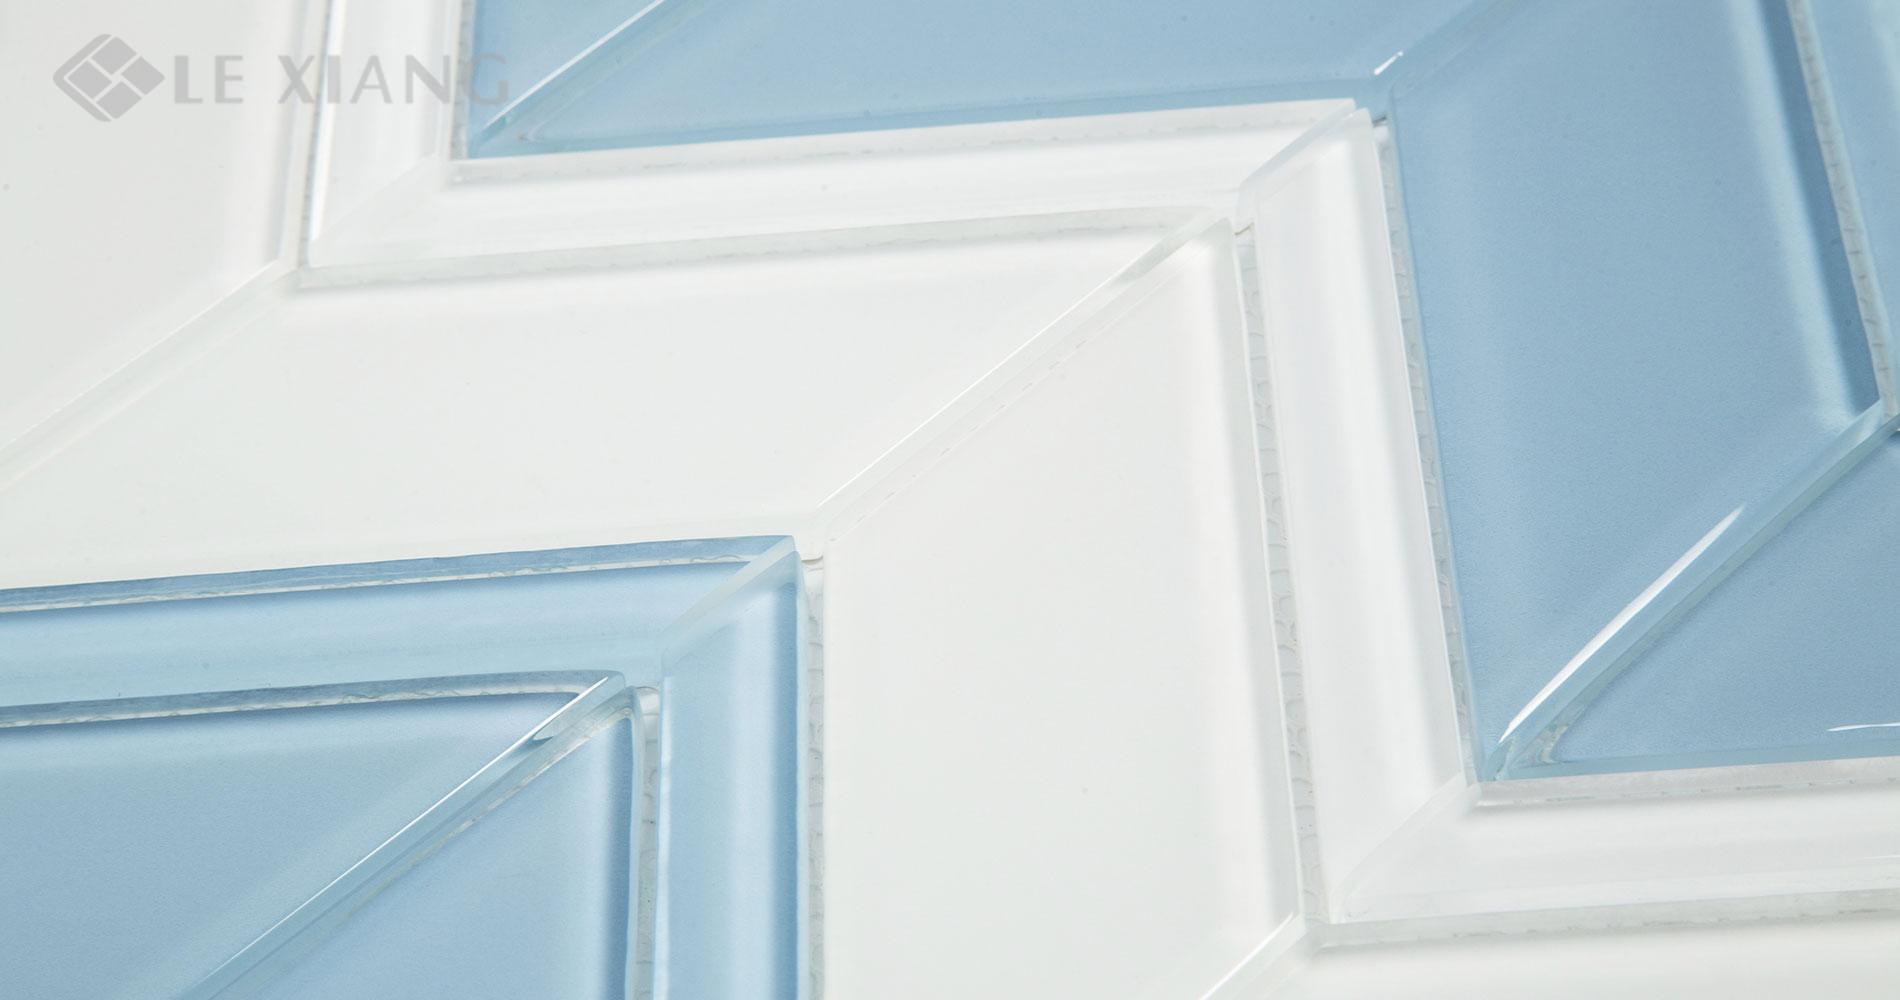 Blends-Chevron-Kitchen-Backsplash-Crystal-Glass-Mosaics-Tile-5